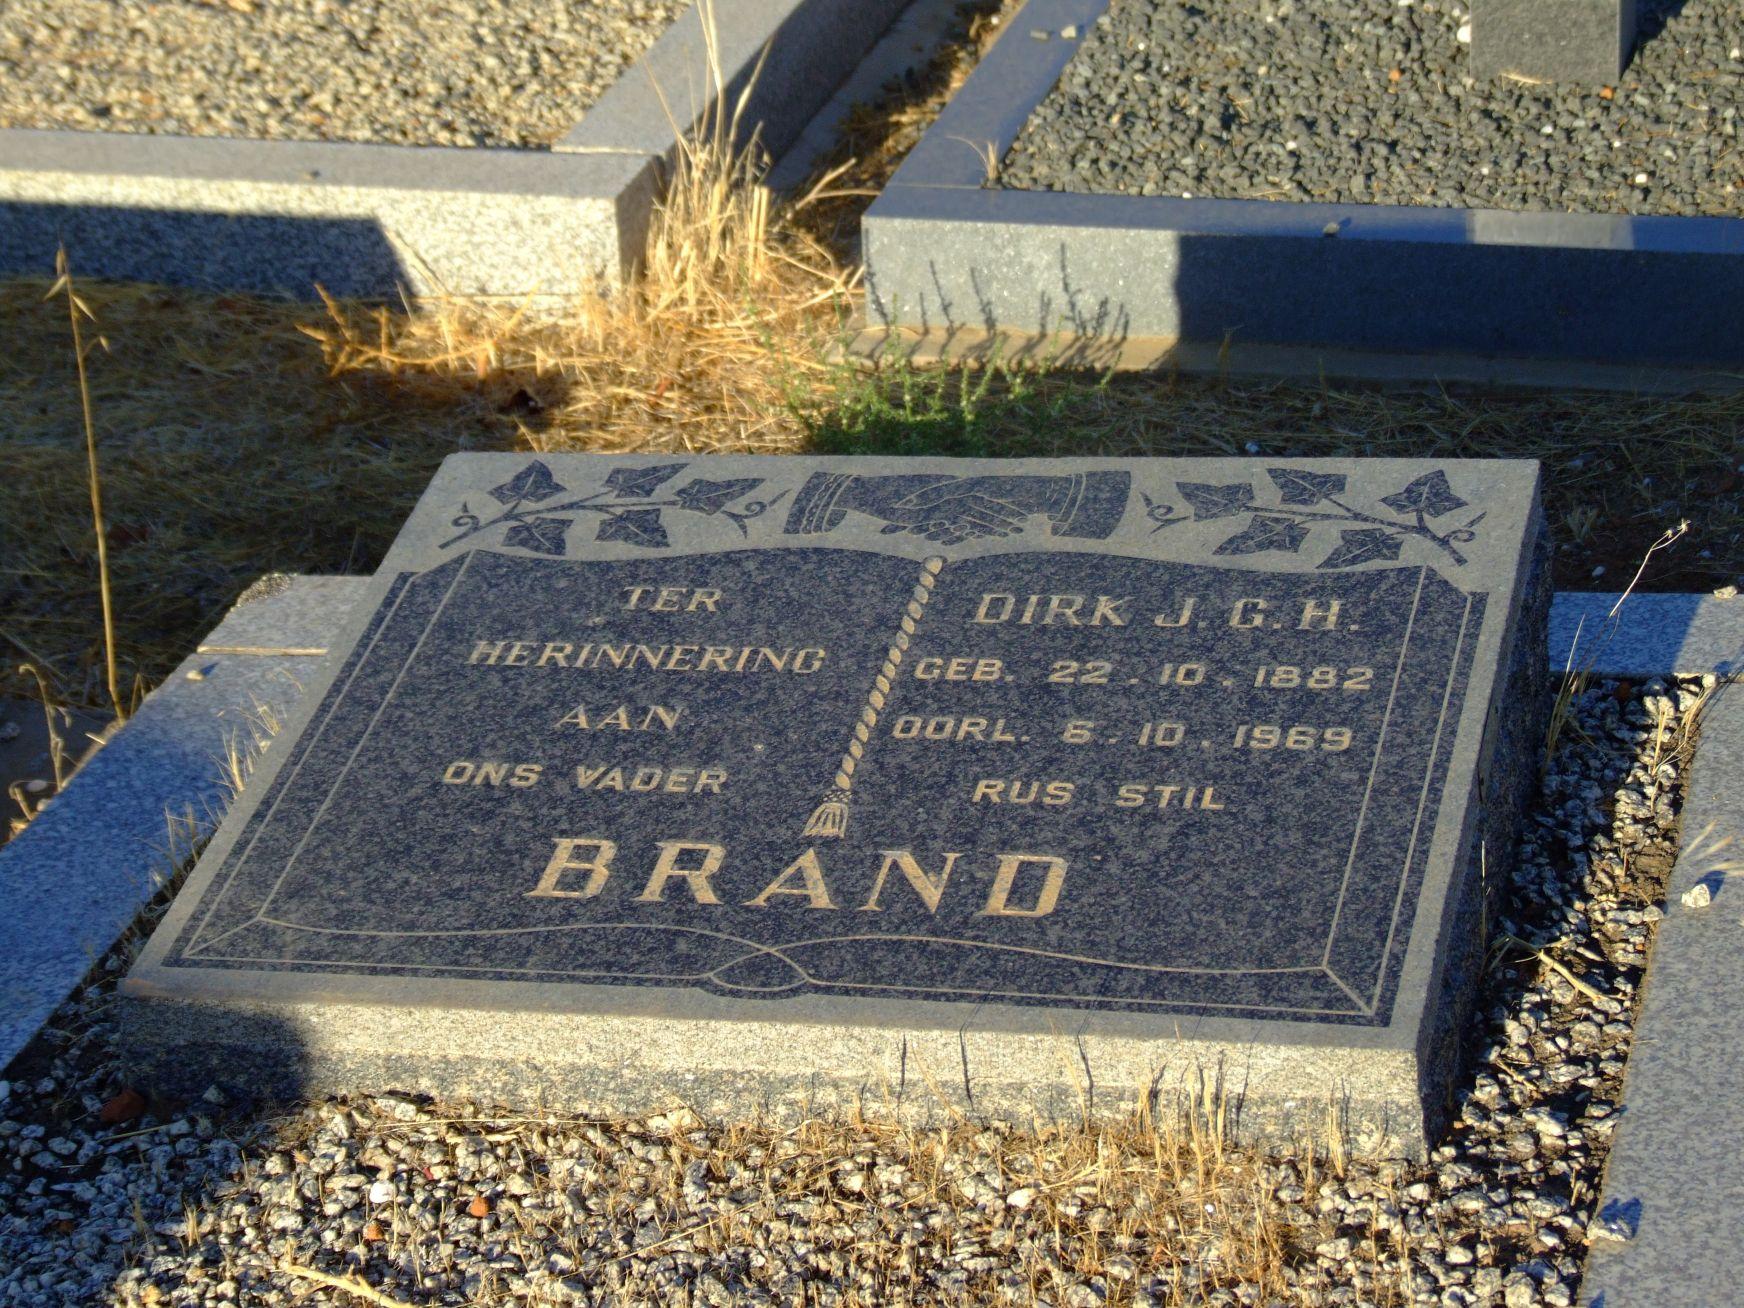 Brand, Dirk J. G. H.